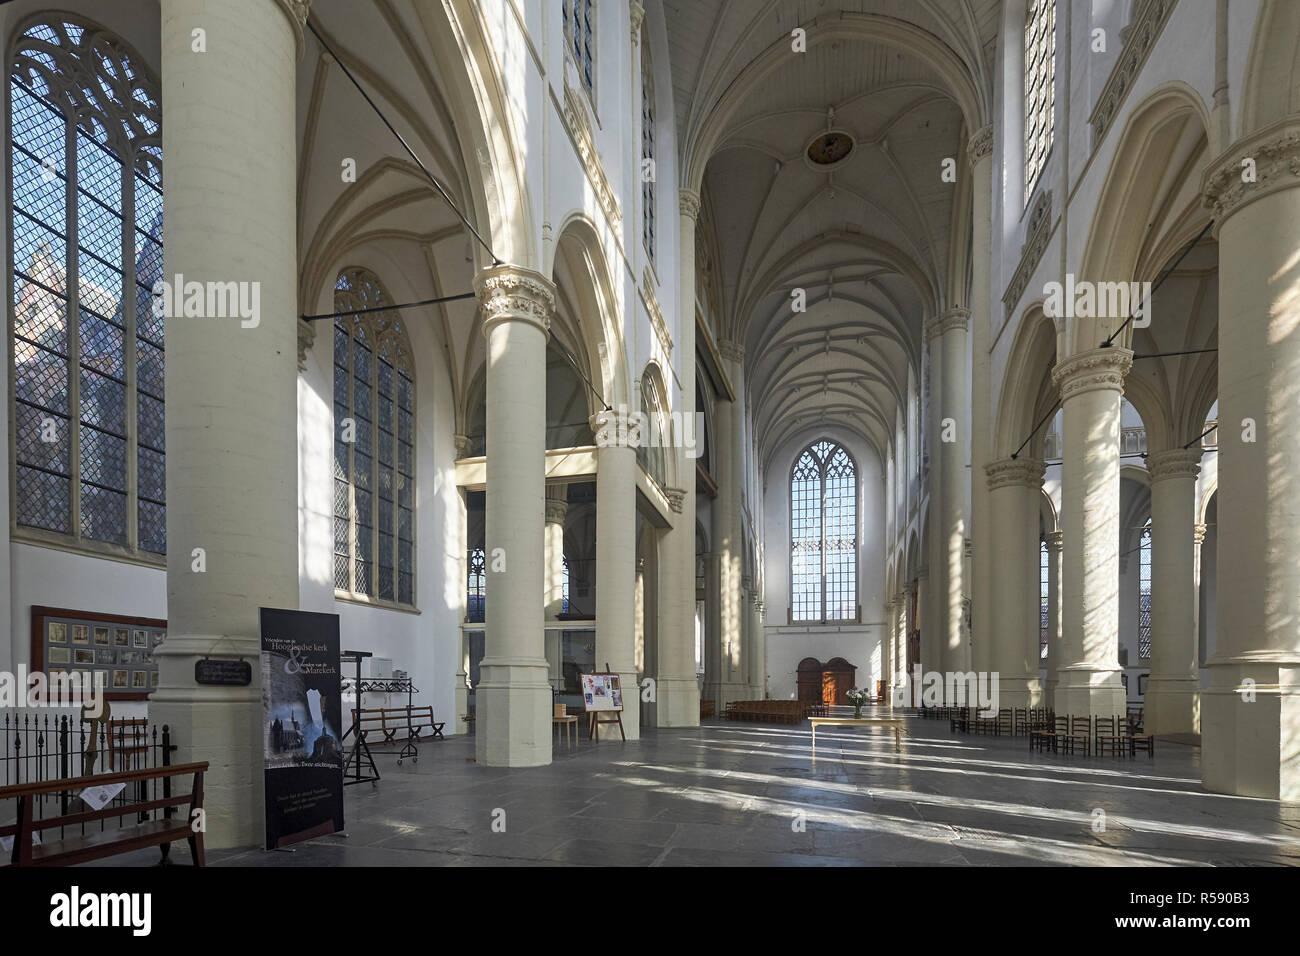 Hooglandse Kerk, Leiden, Hollande méridionale, Pays-Bas Banque D'Images